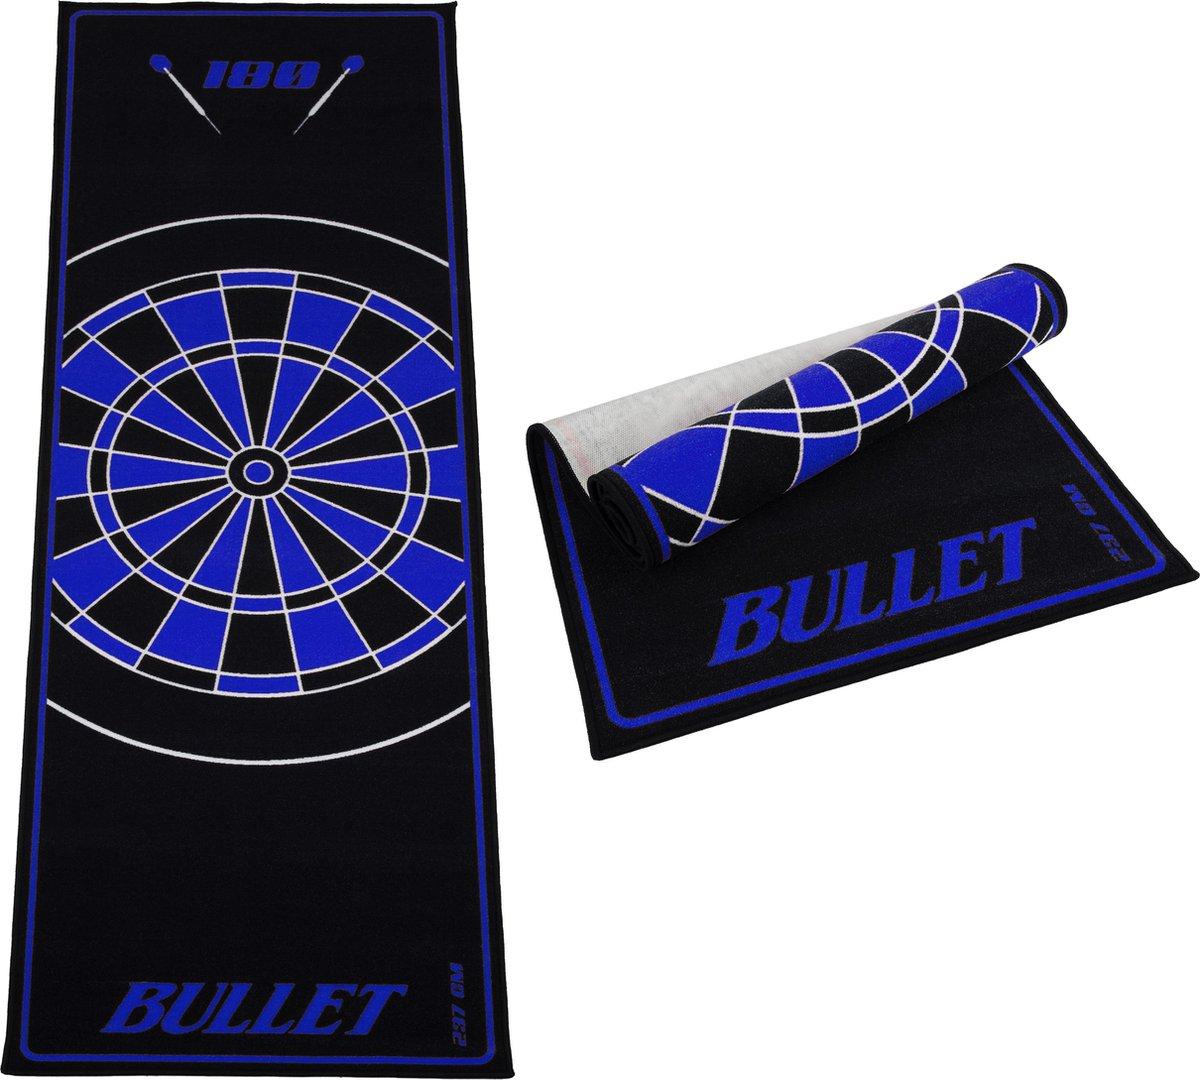 Dragon darts - dartmat - Bullet blauw 237x80 cm - dart mat - dart vloerkleed